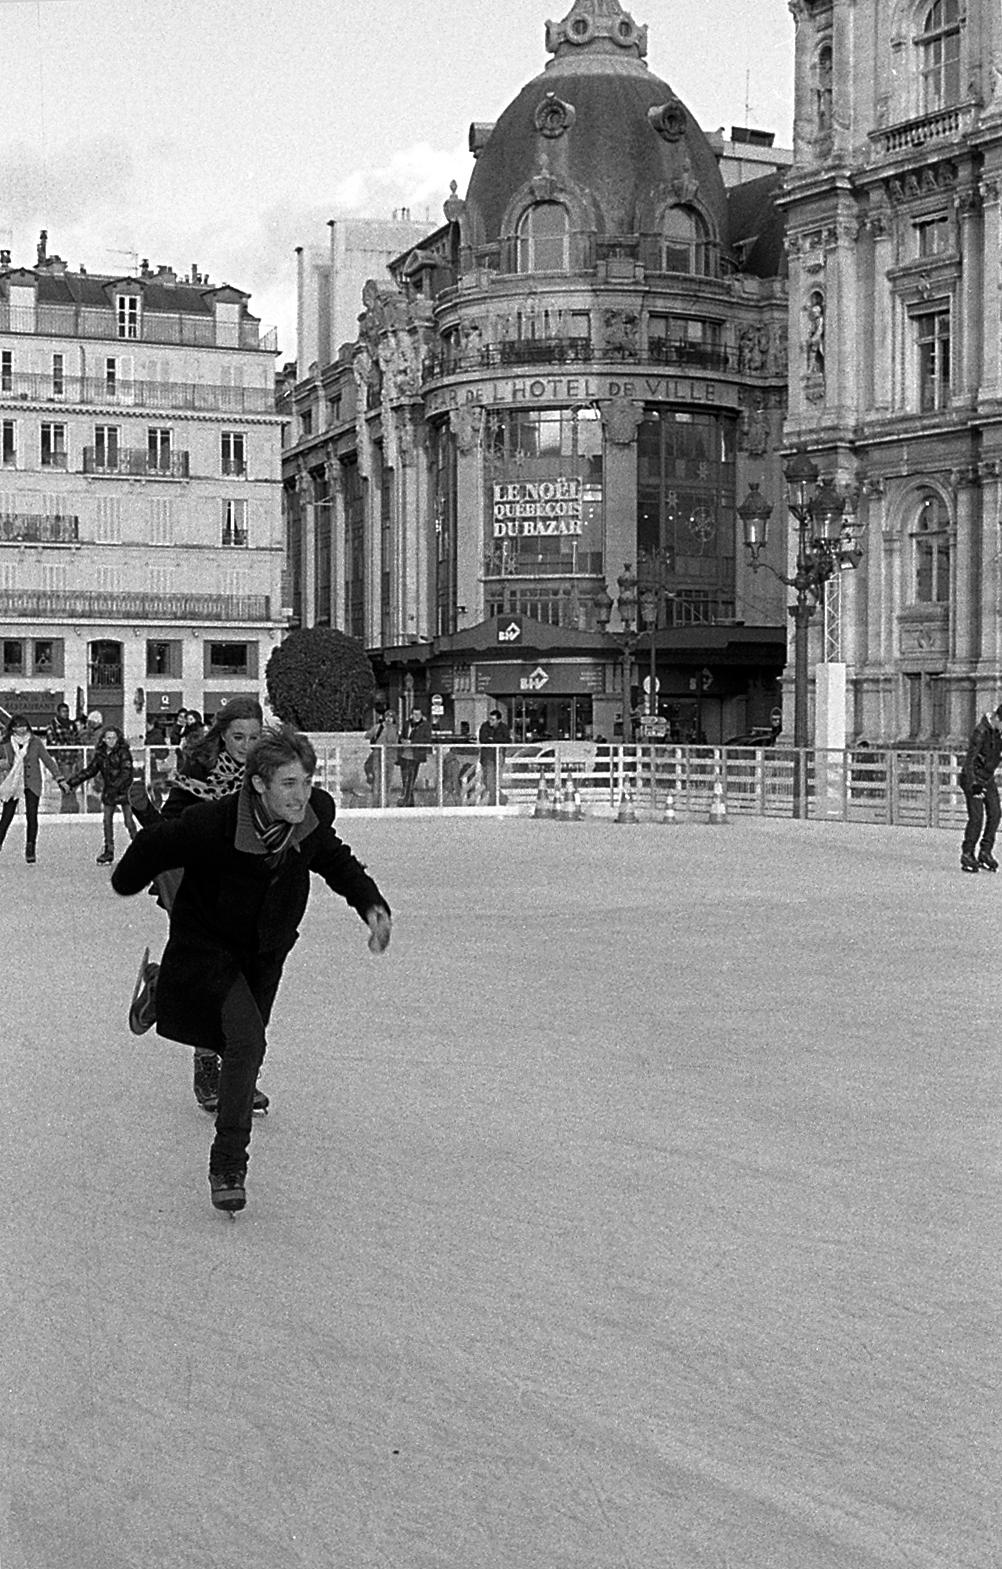 SIDE GALLERY: Henry Walker's Paris  12/09/15 - 01/15/16